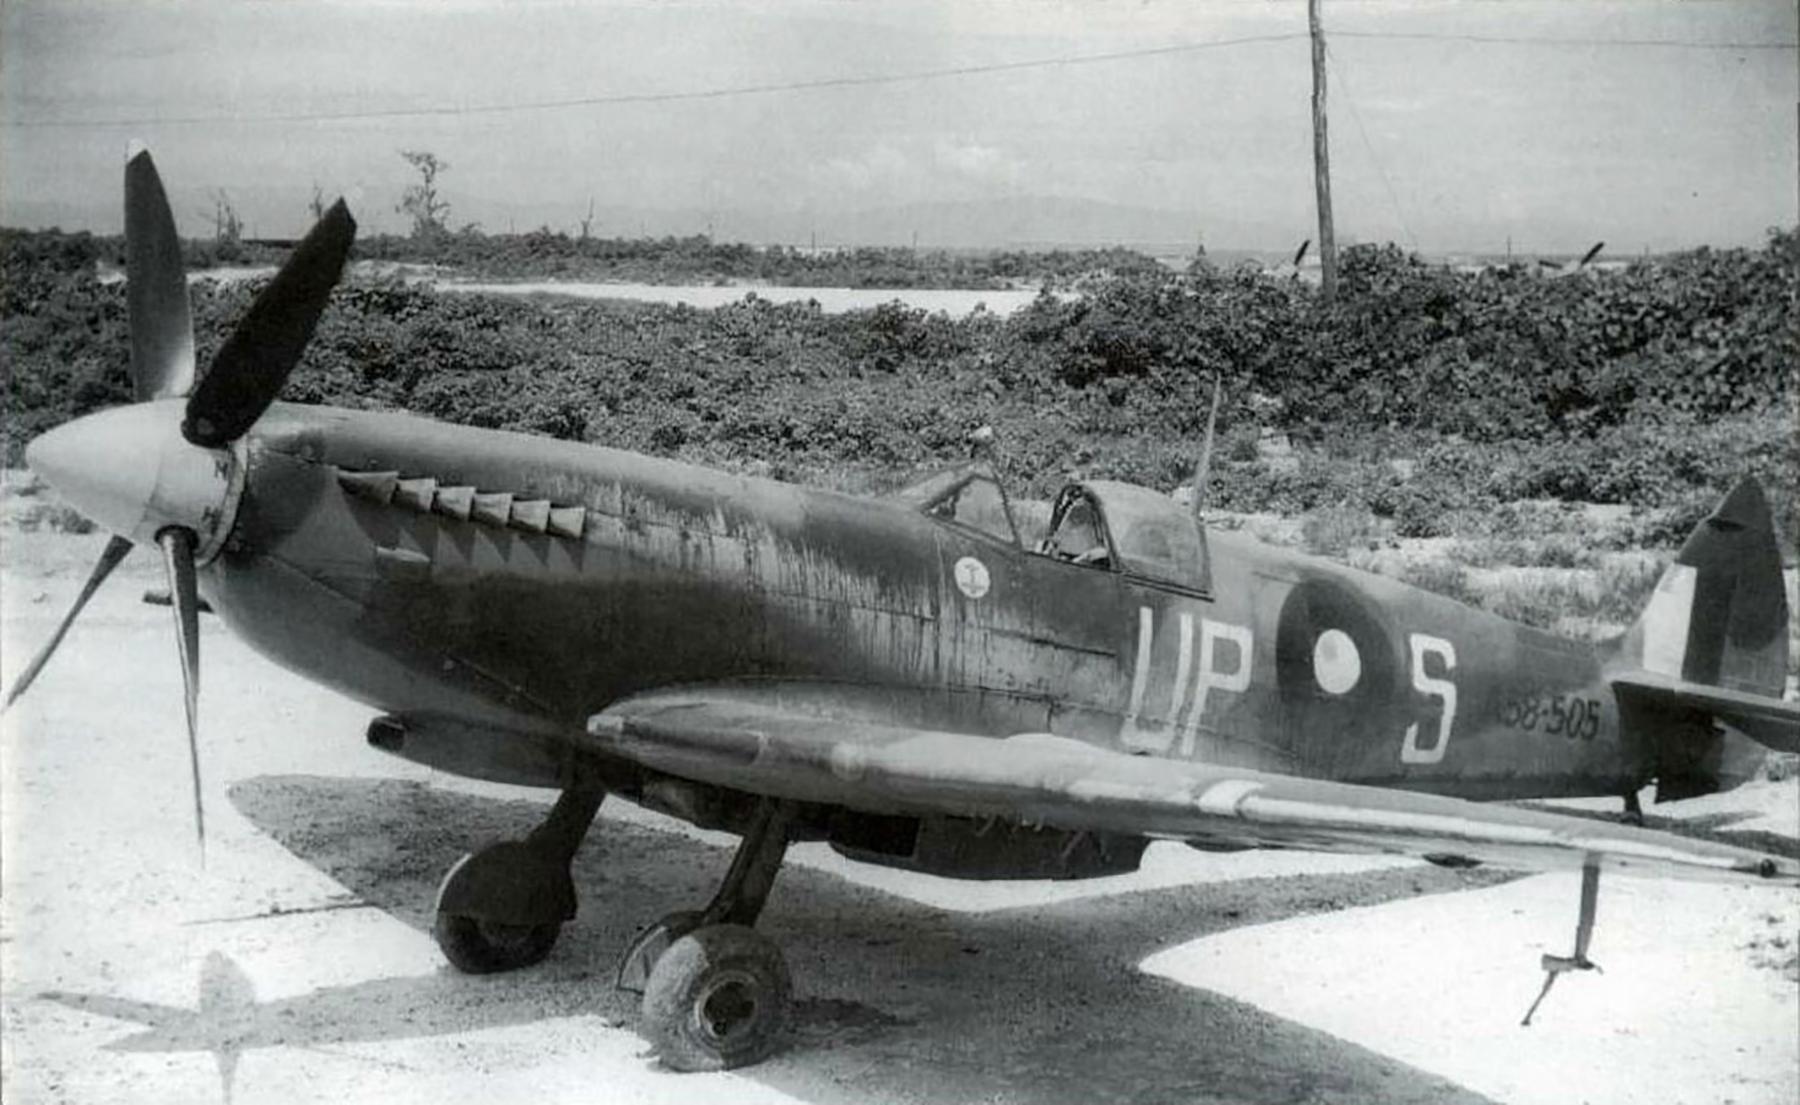 Spitfire LFVIII RAAF 79Sqn UPS A58 505 Morotai 1945 01